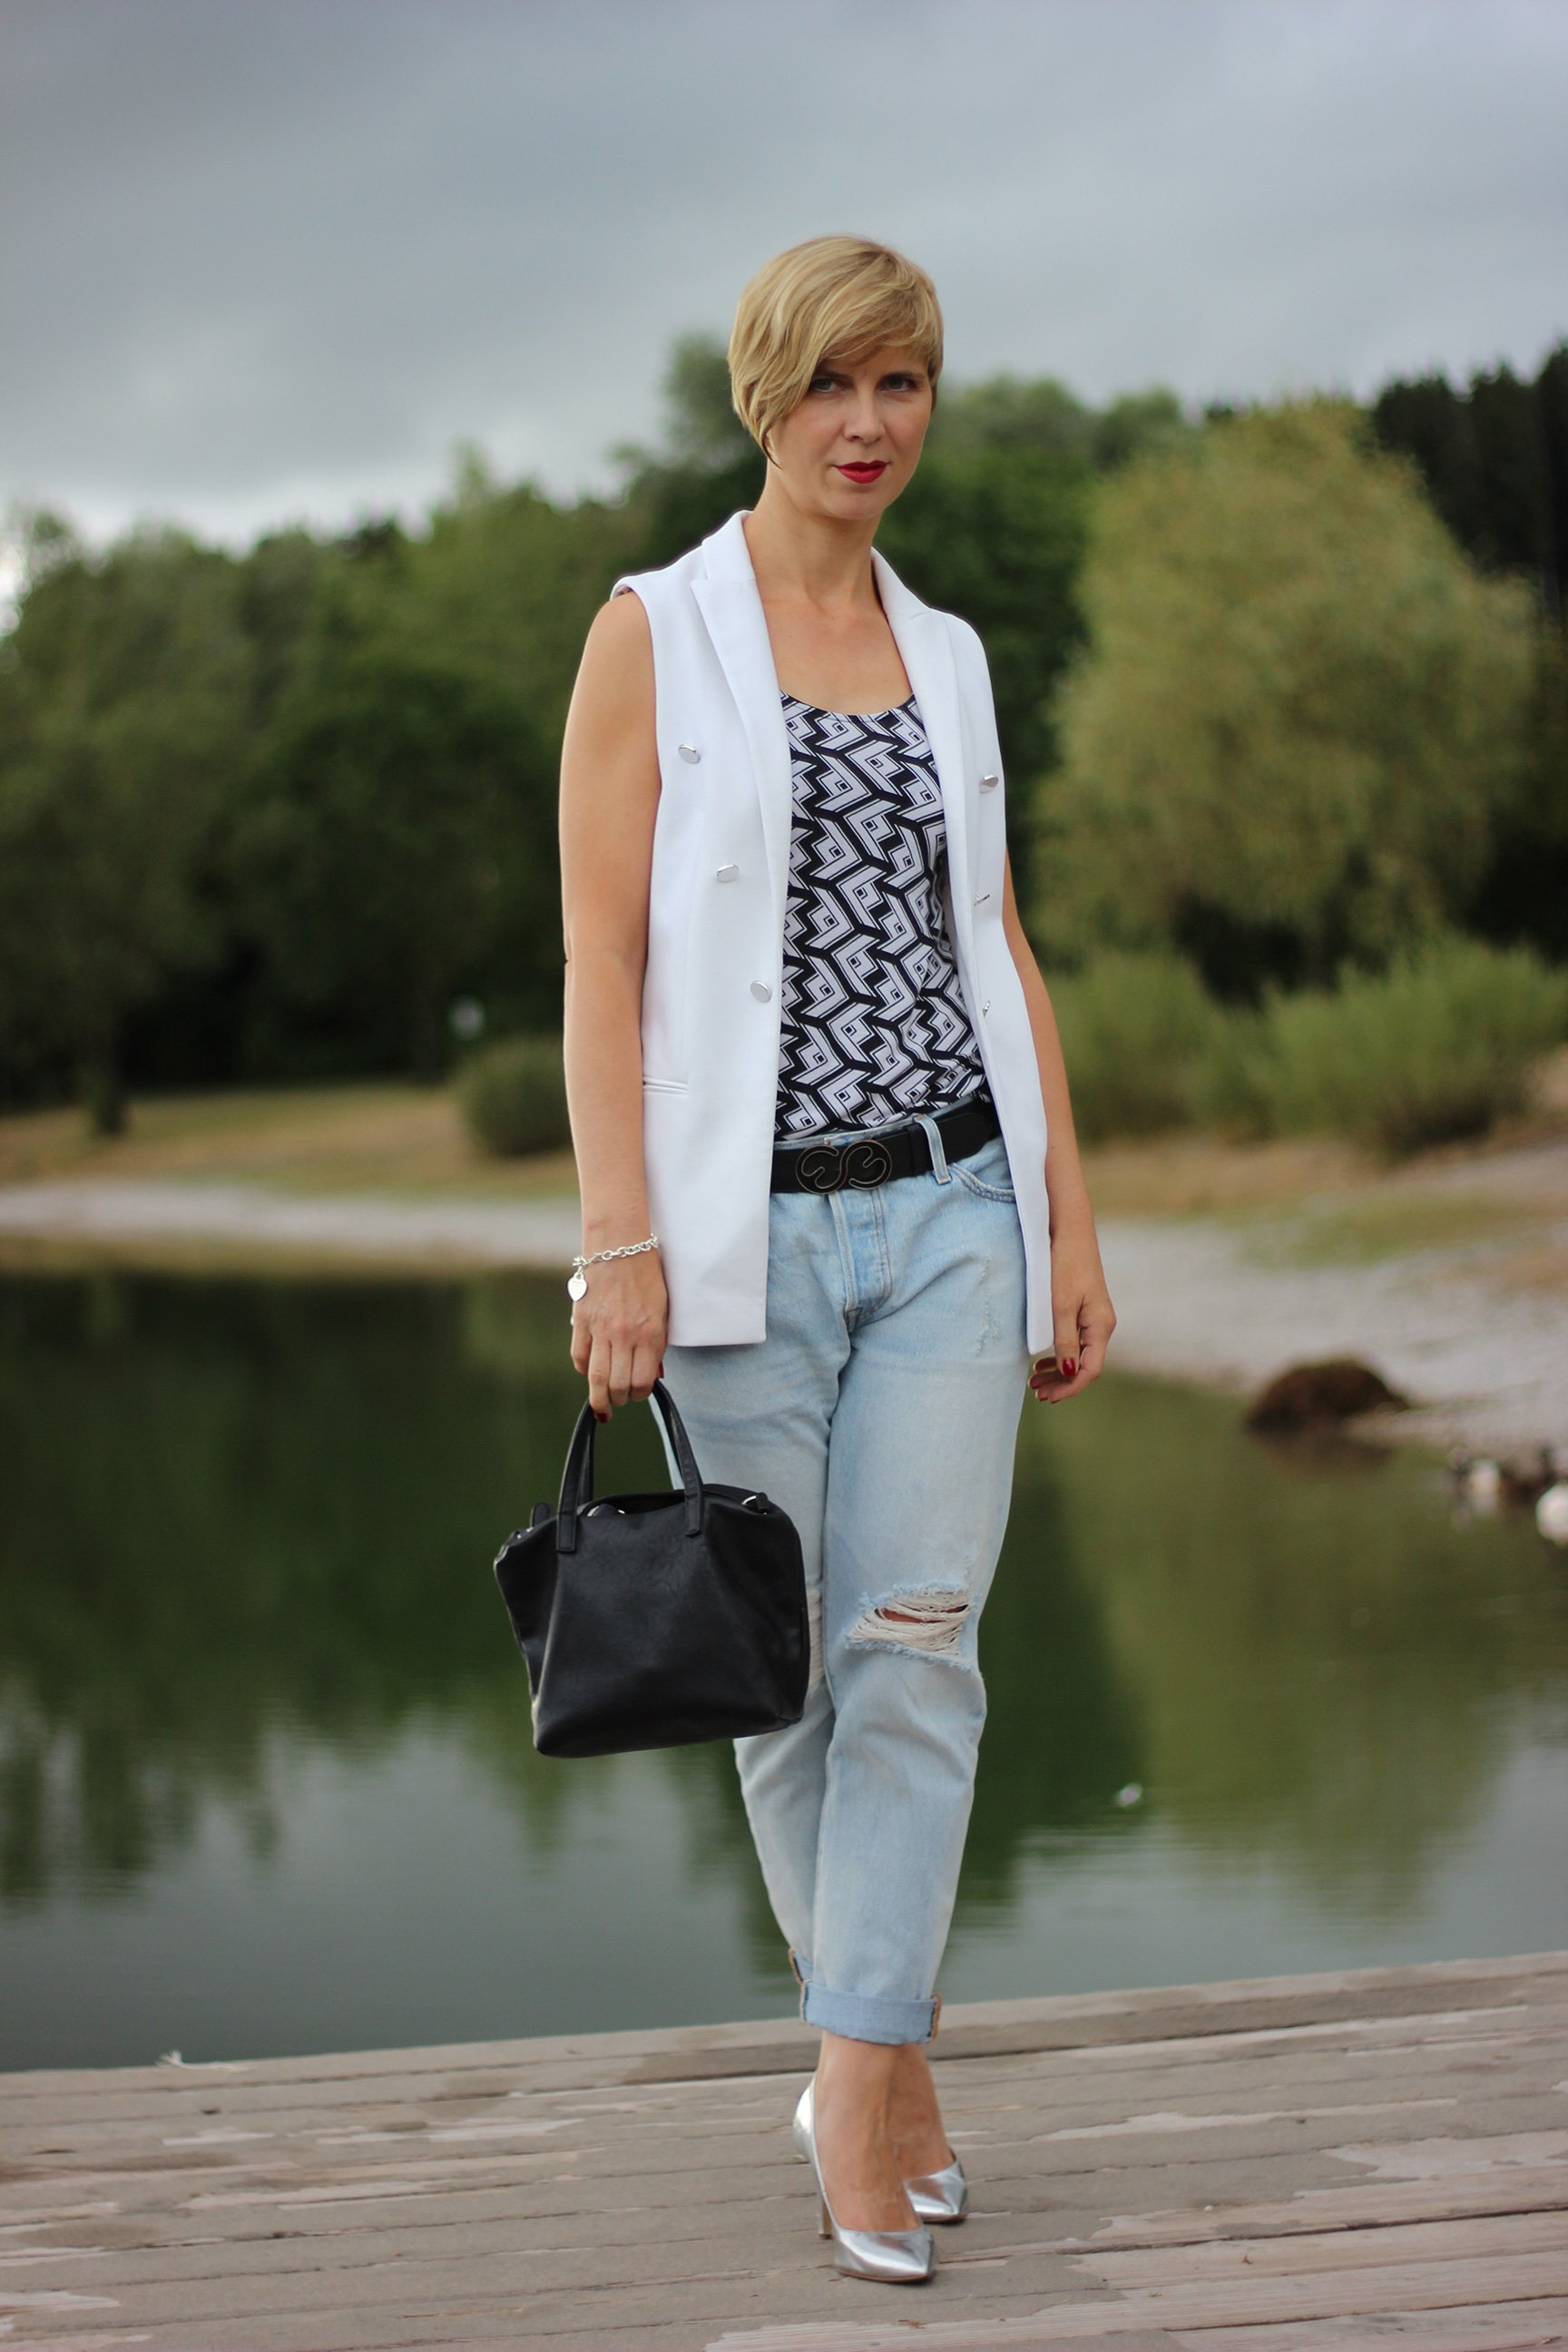 IMG_0460a_Levis501_DestroyedJeans_ü40_fashionblog_oui_weste_MetallicHeels_blackandwhite_schwarz_weiß_Top_casual_Ahemadundahos